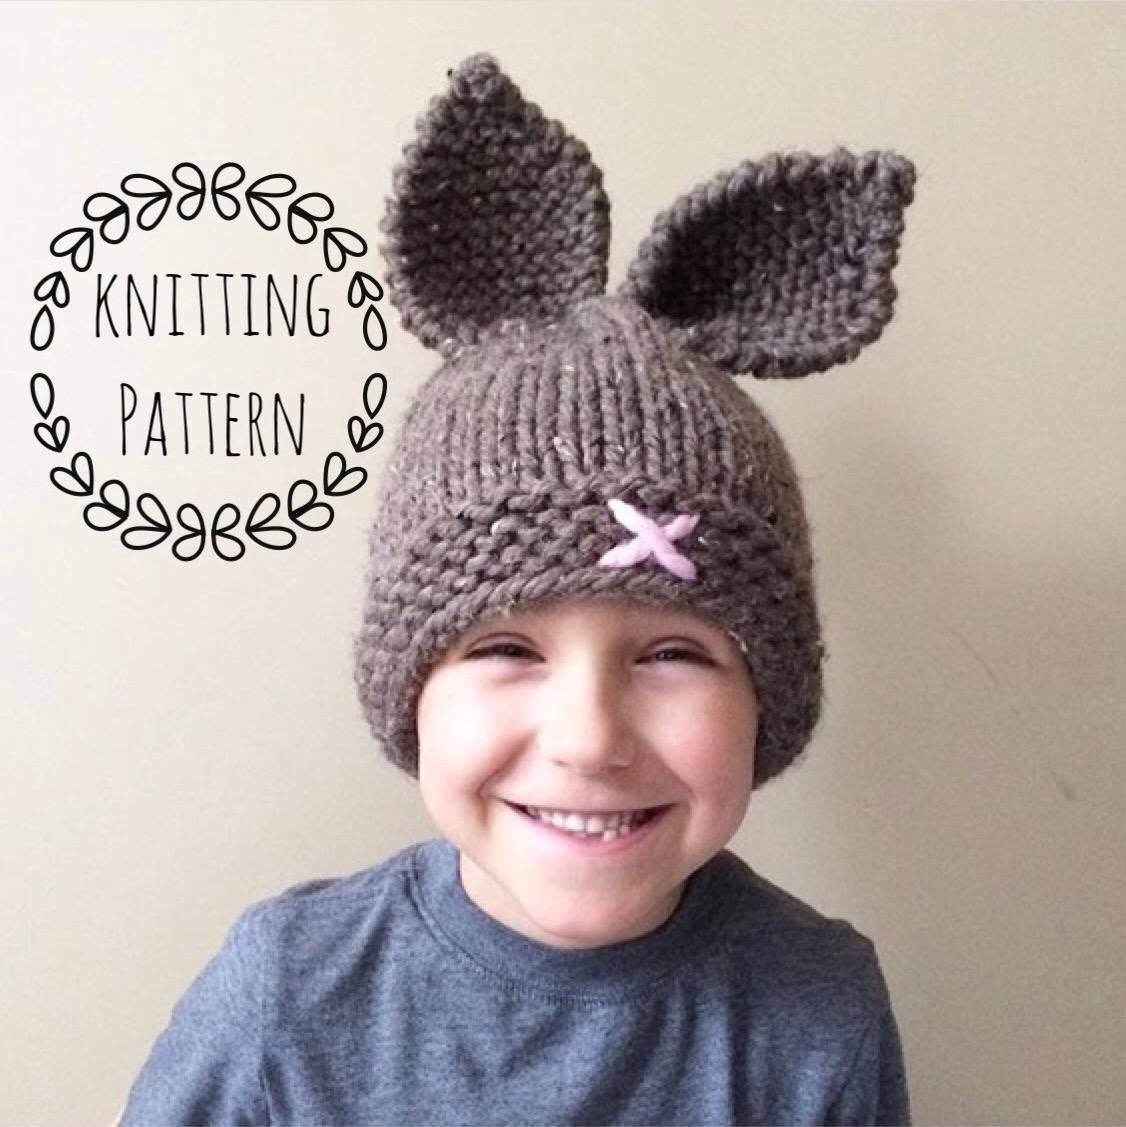 Rustic Knit Bunny Toque, Knitting Pattern,Knit Hat, Knit Hat Pattern ...